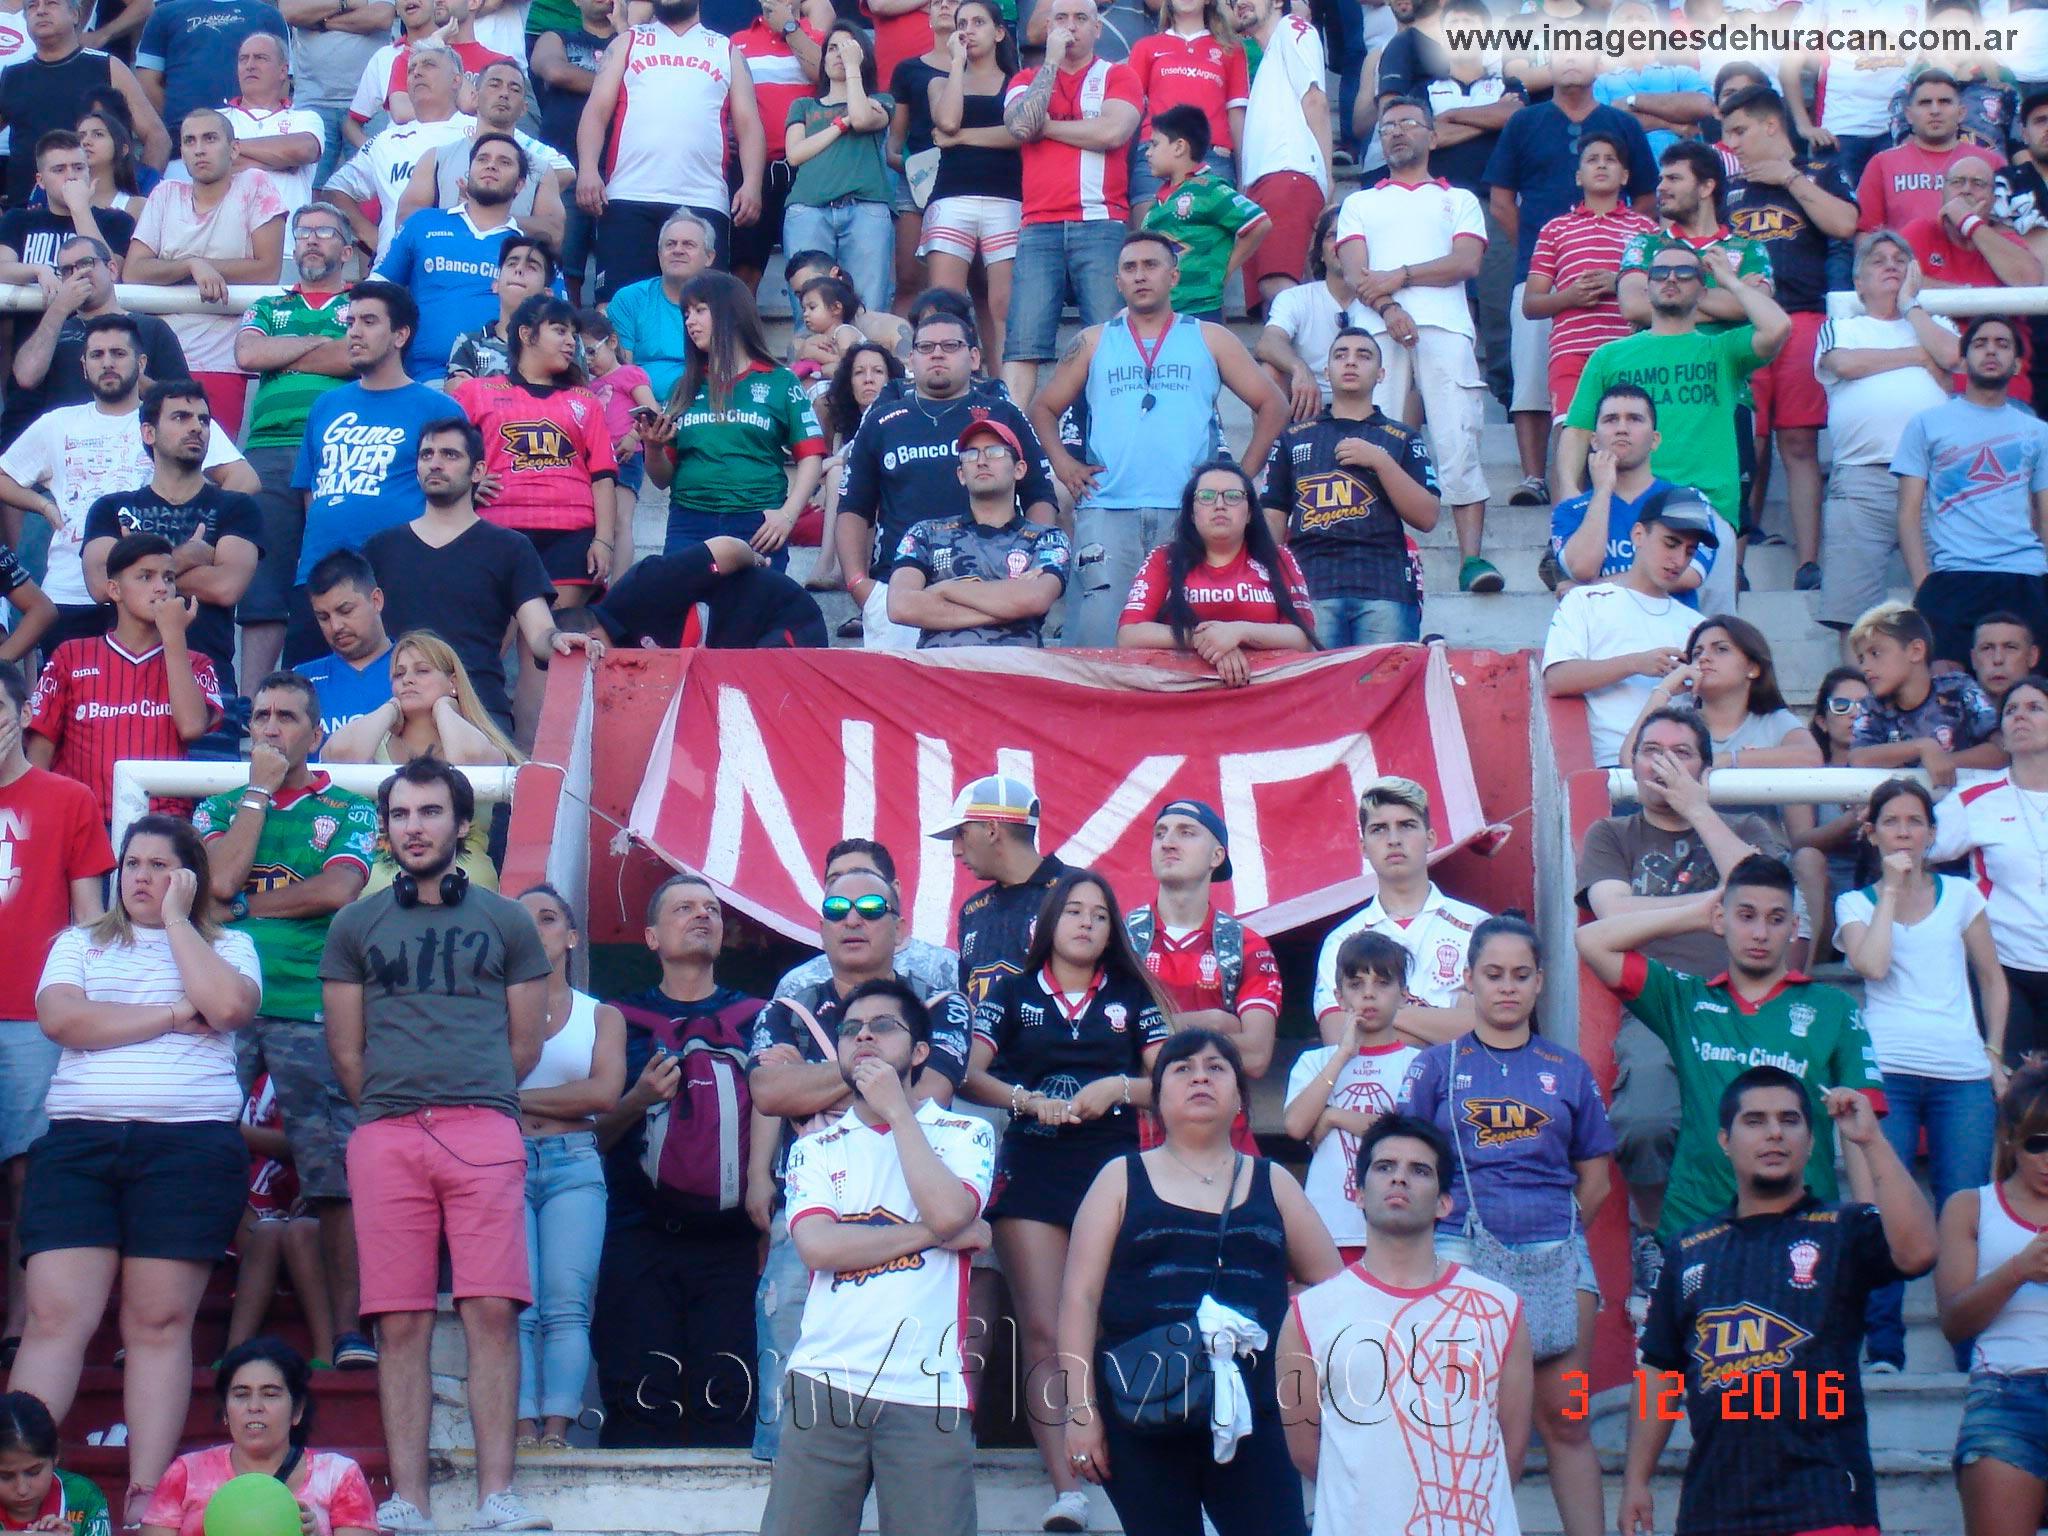 Huracán vs Colón fecha 12 torneo primera división 2016-2017